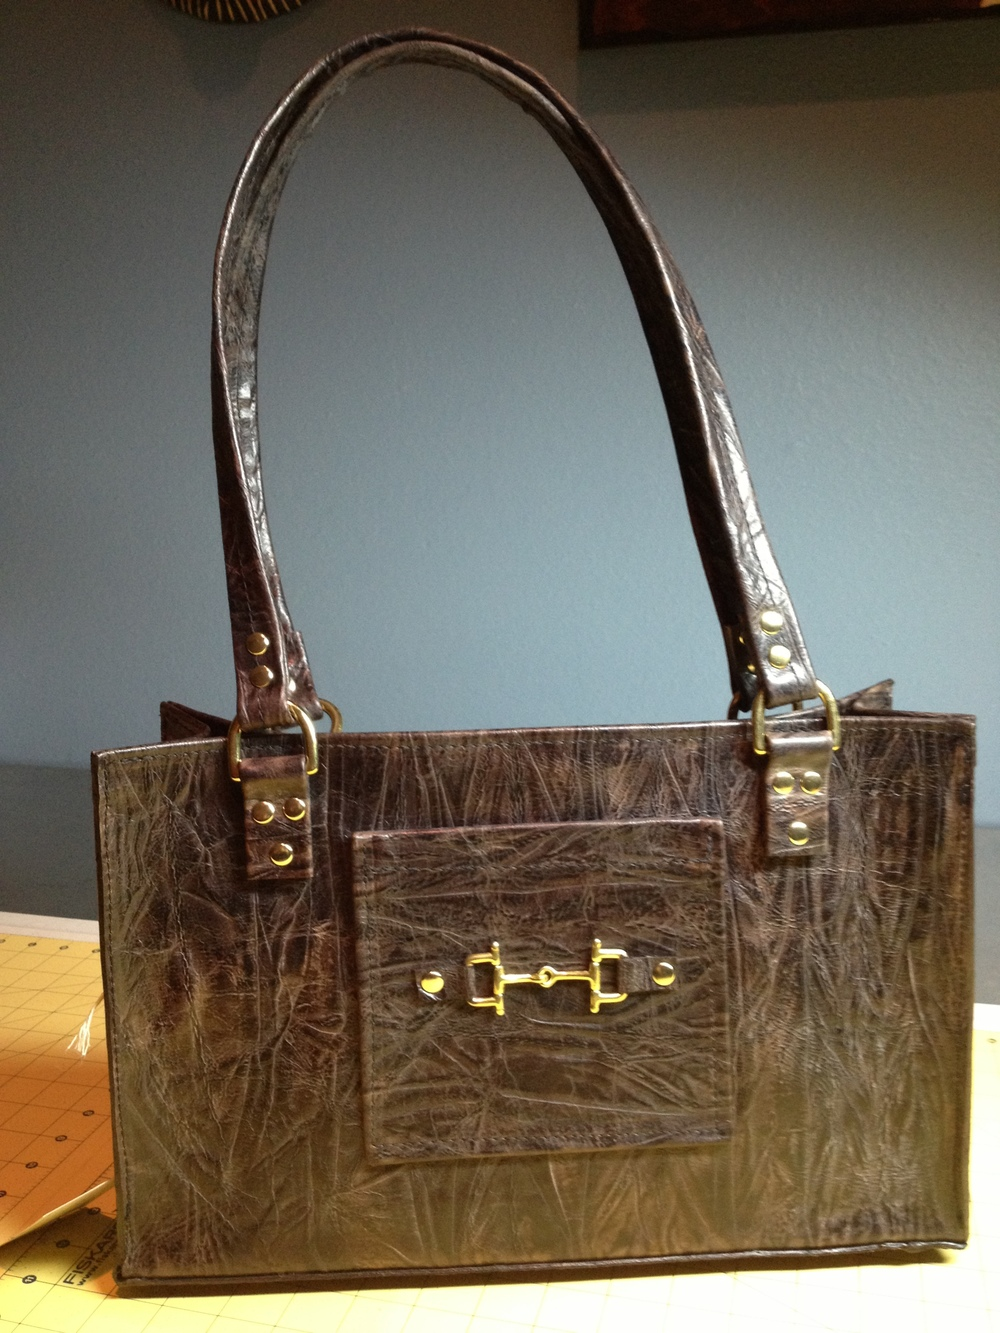 Equestrian style Handbag